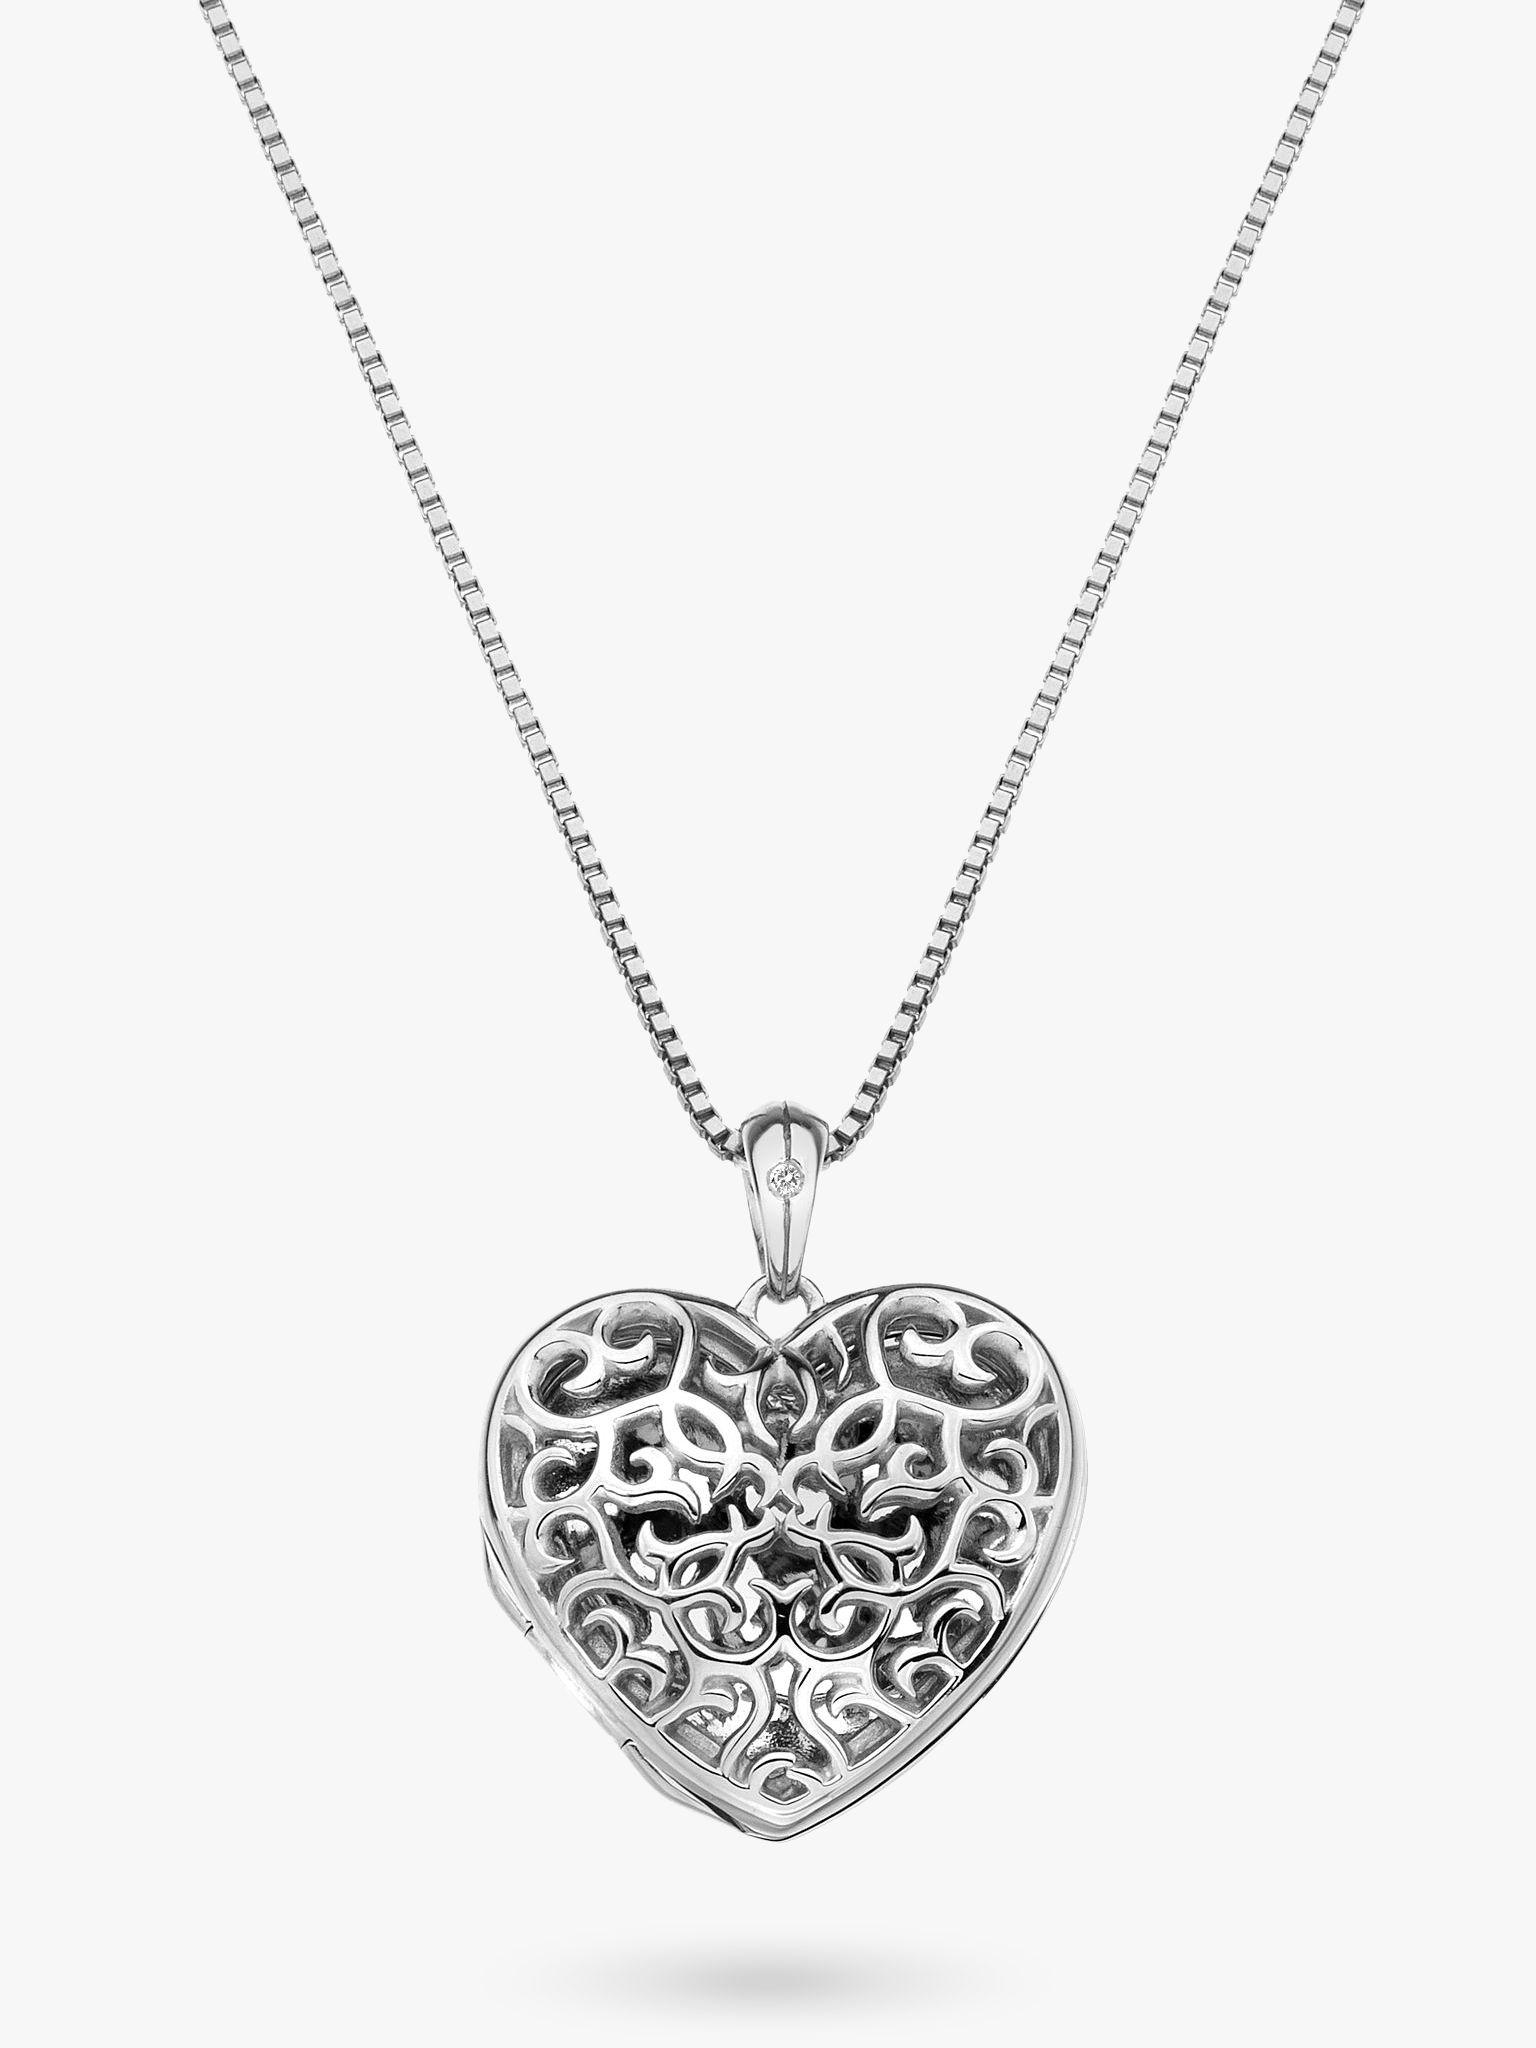 Hot Diamonds Hot Diamonds Small Heart Filigree Locket Pendant Necklace, Silver